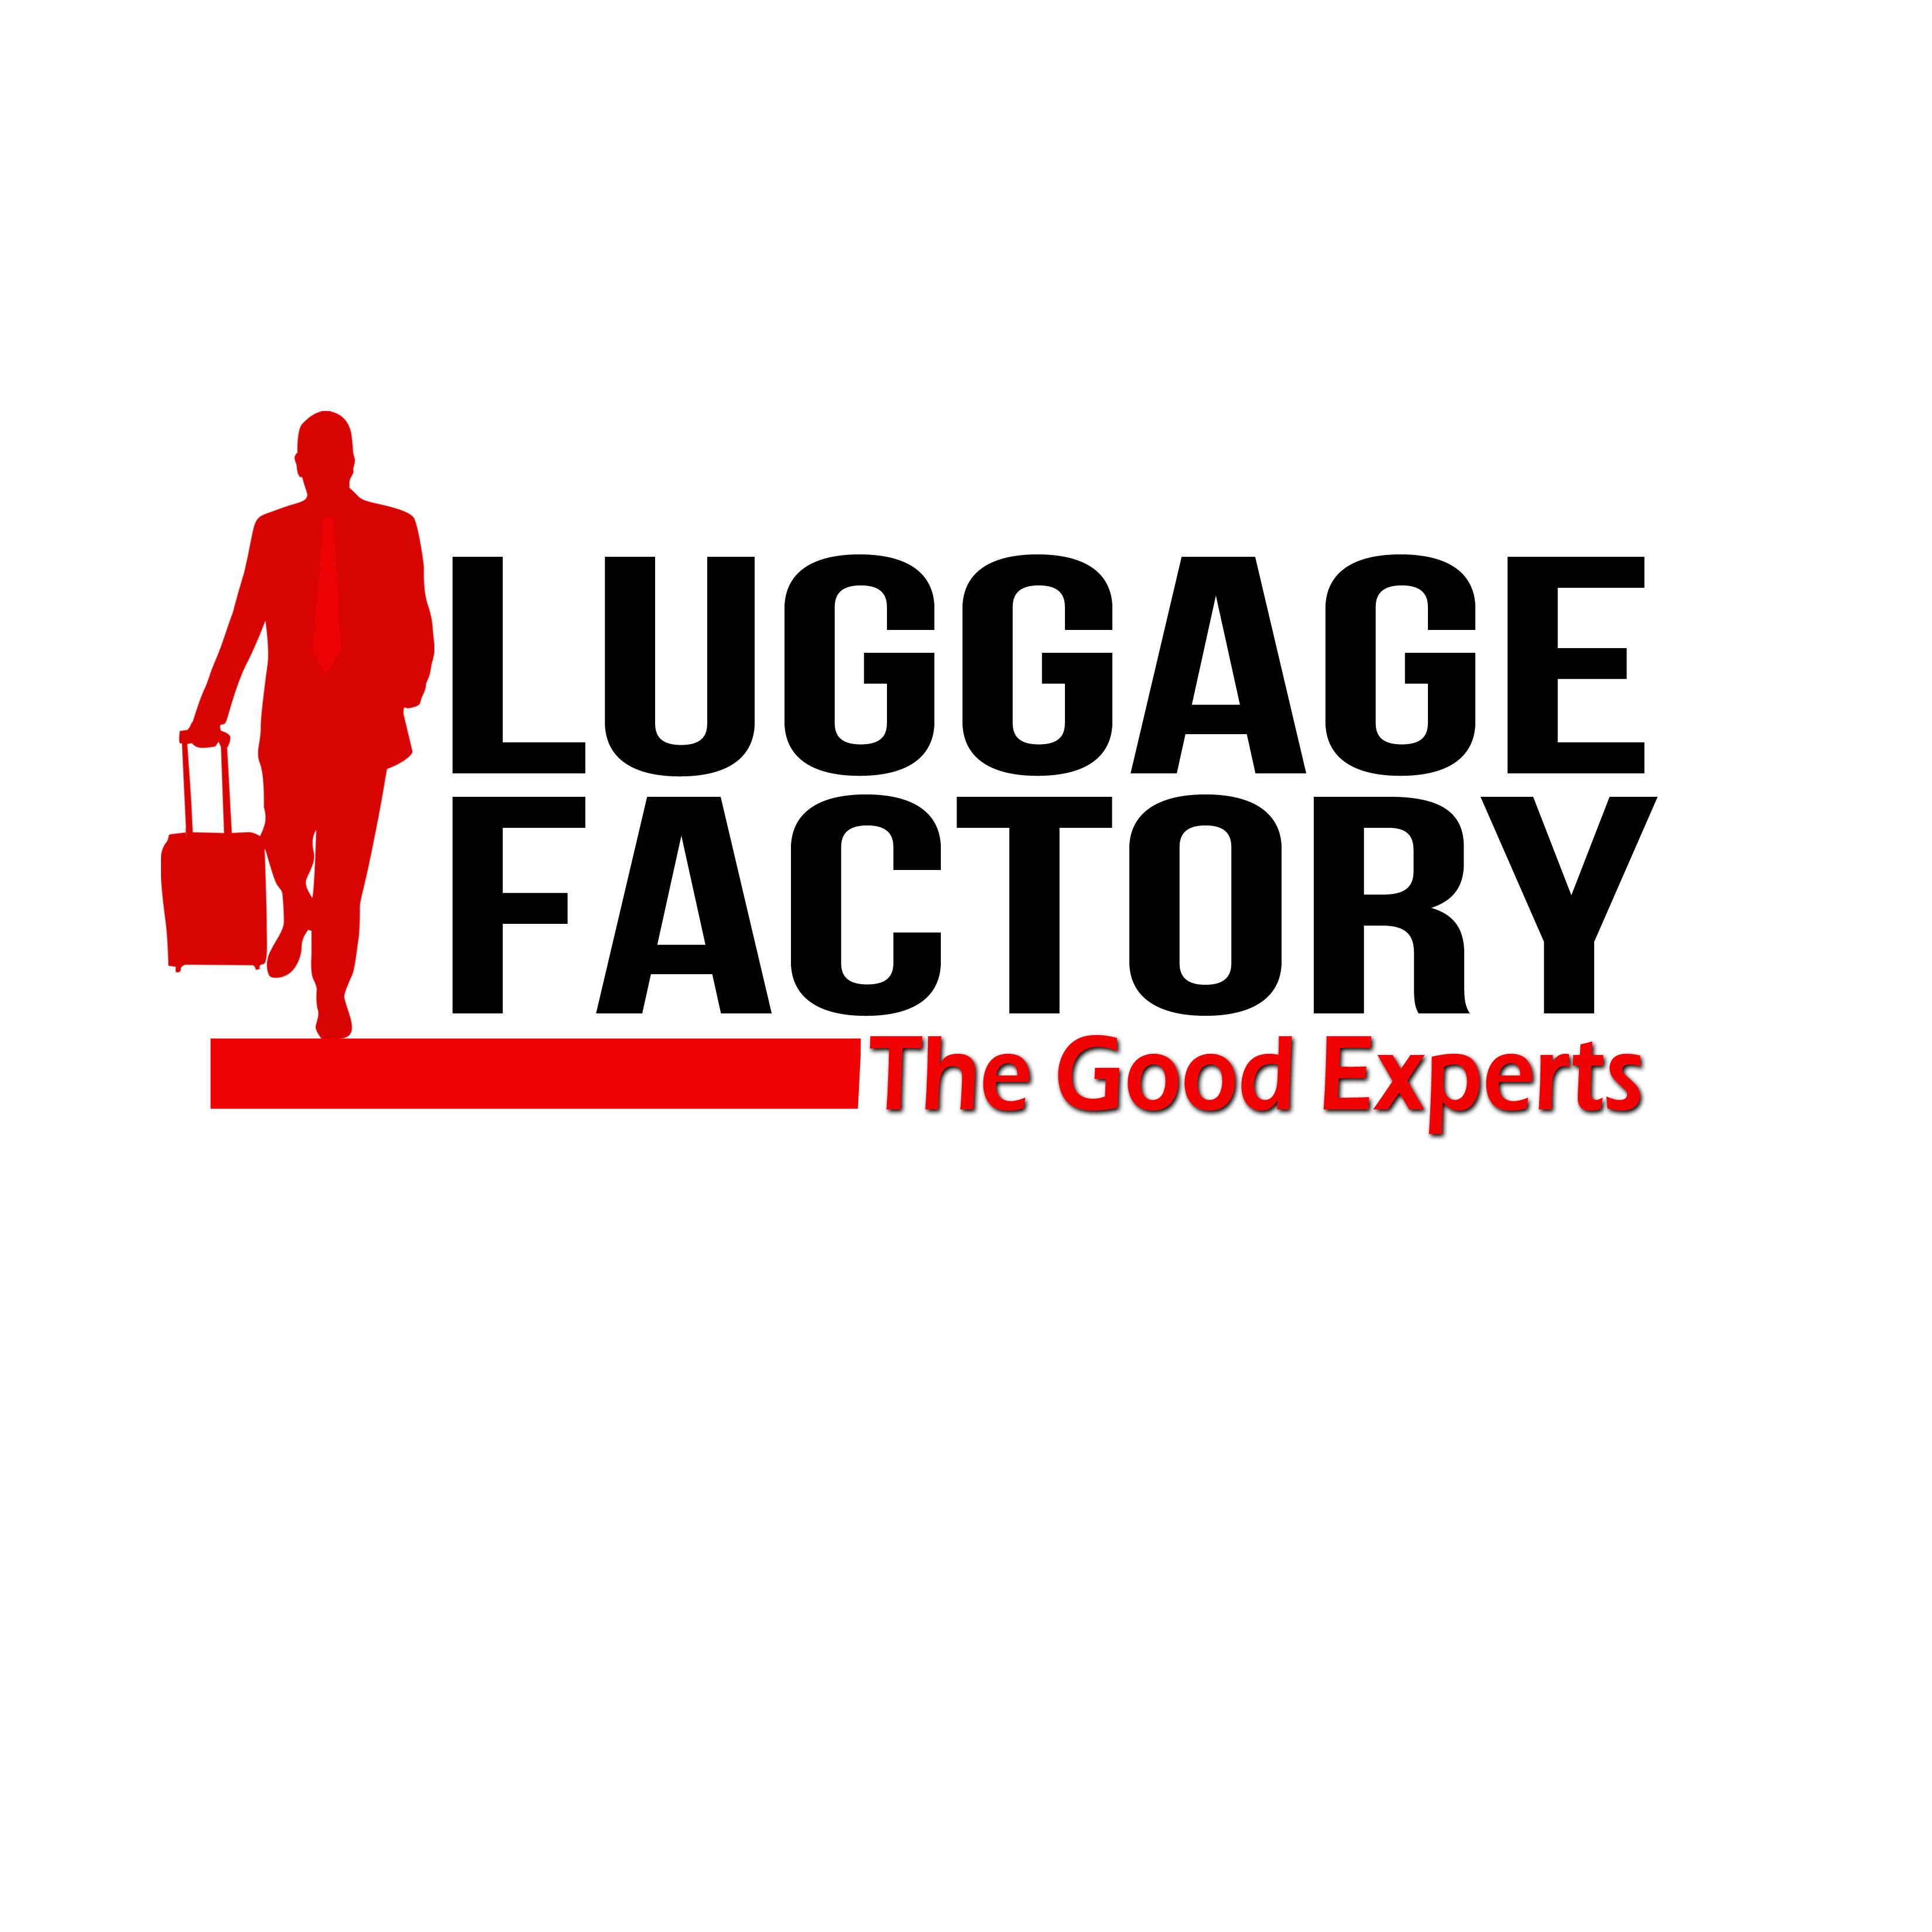 Logo Design by Allan Esclamado - Entry No. 211 in the Logo Design Contest Creative Logo Design for Luggage Factory.